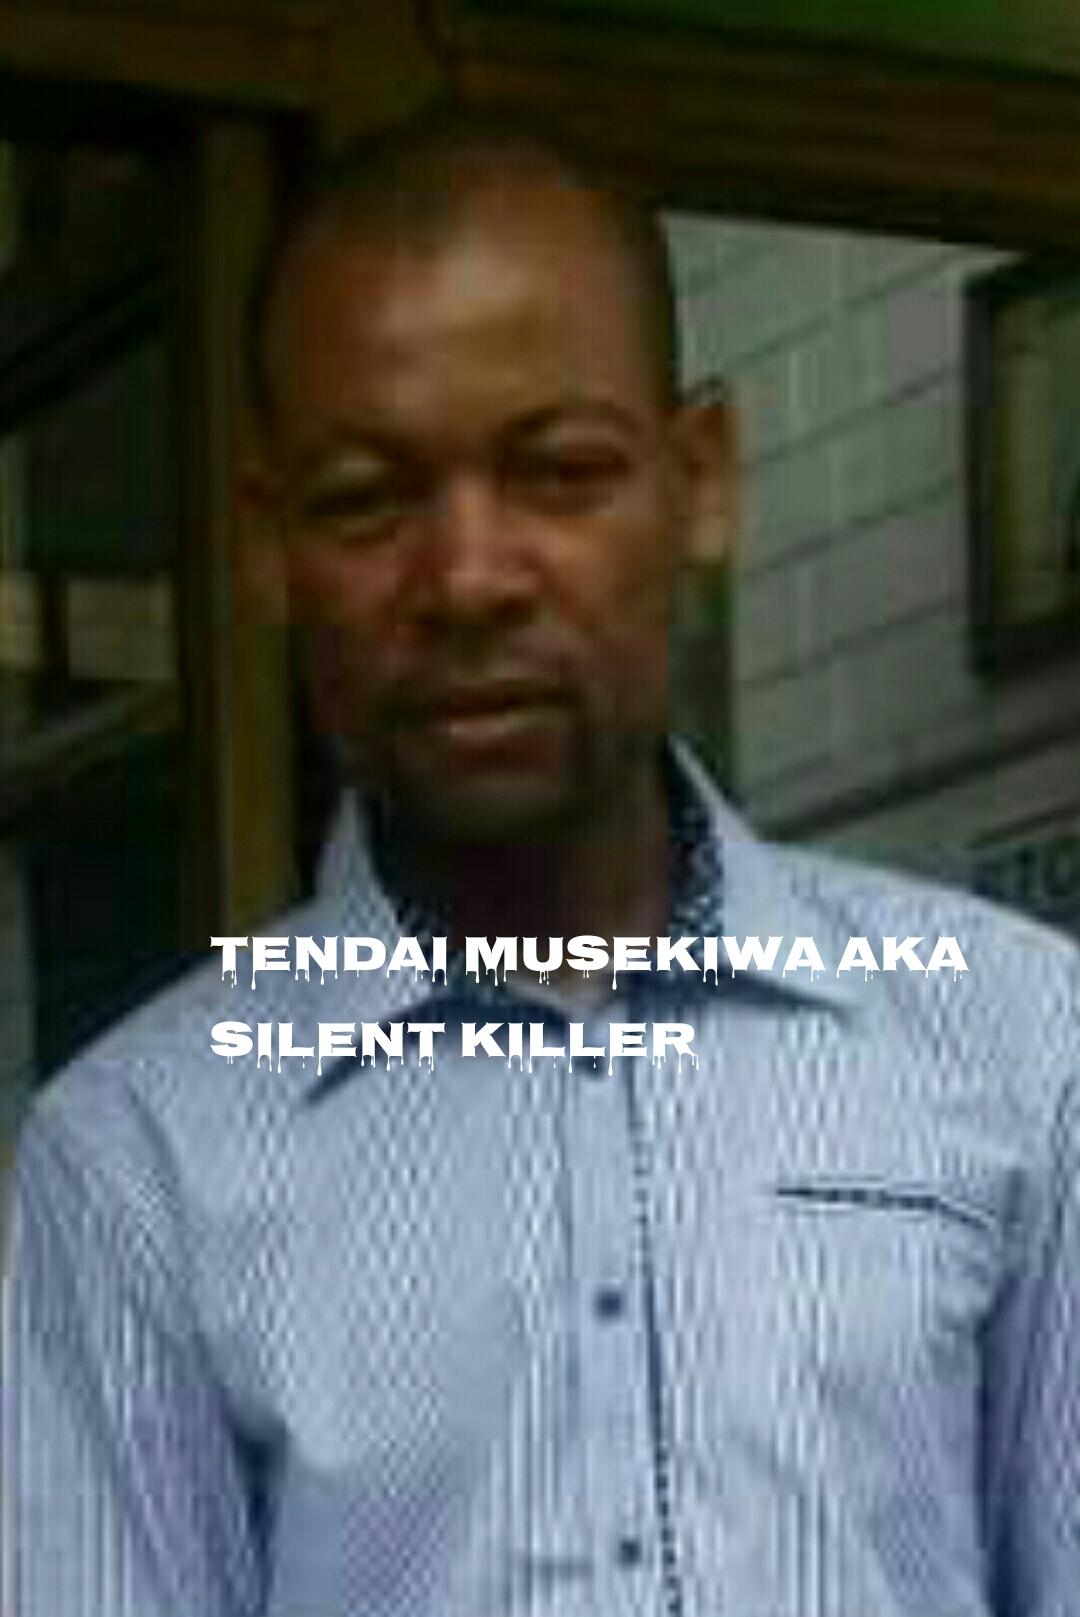 Alleged Habitual Criminal Tendai Musekiwa Aka Silent Killer Profile - Musvo Zimbabwe-7511